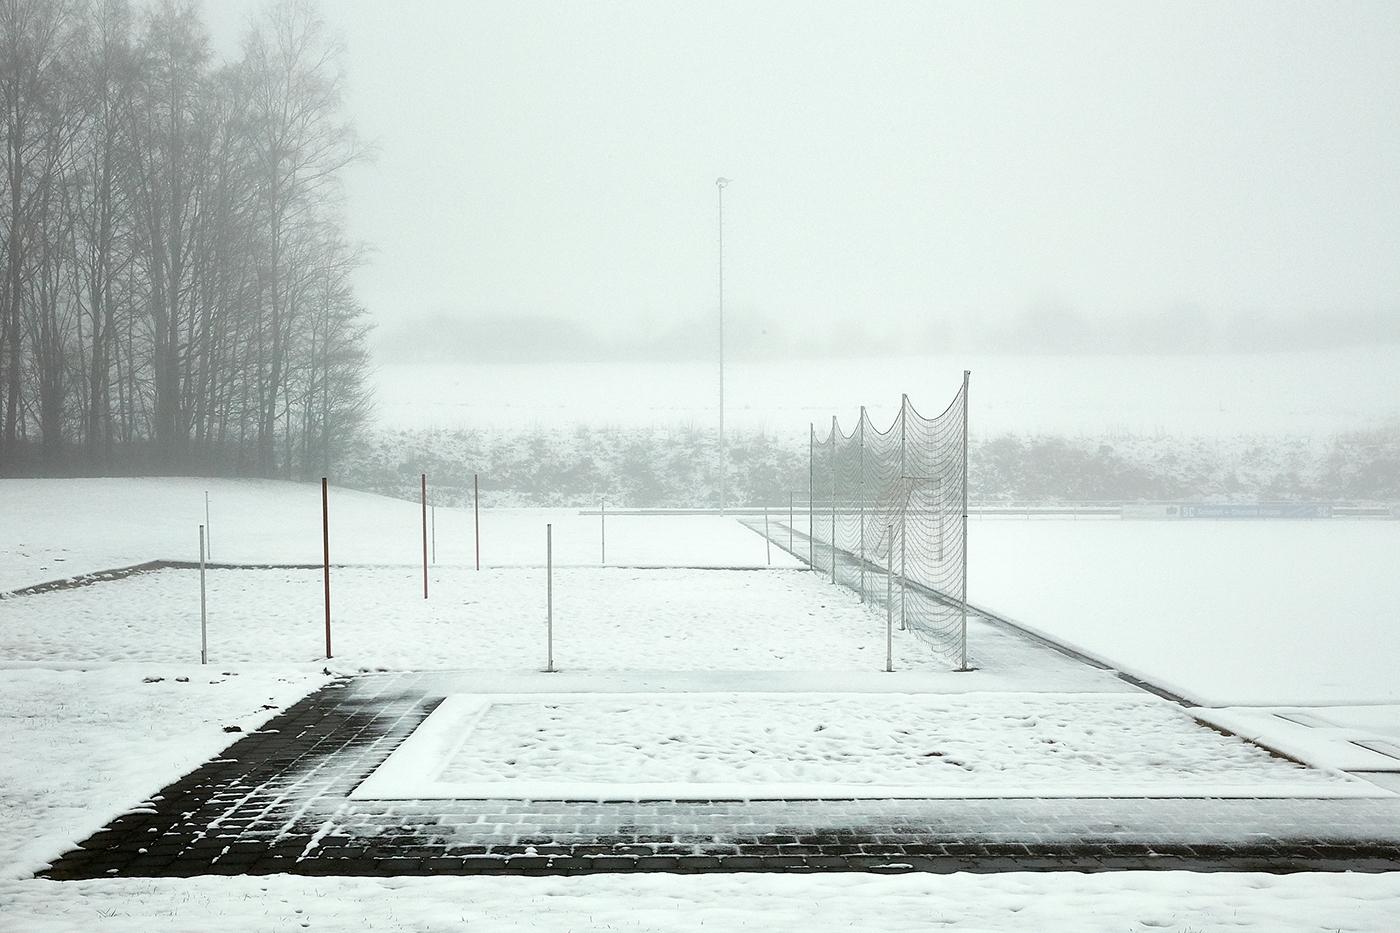 sports field sports ground Soccer Field winter snow Landscape fog misty atmospheric goal